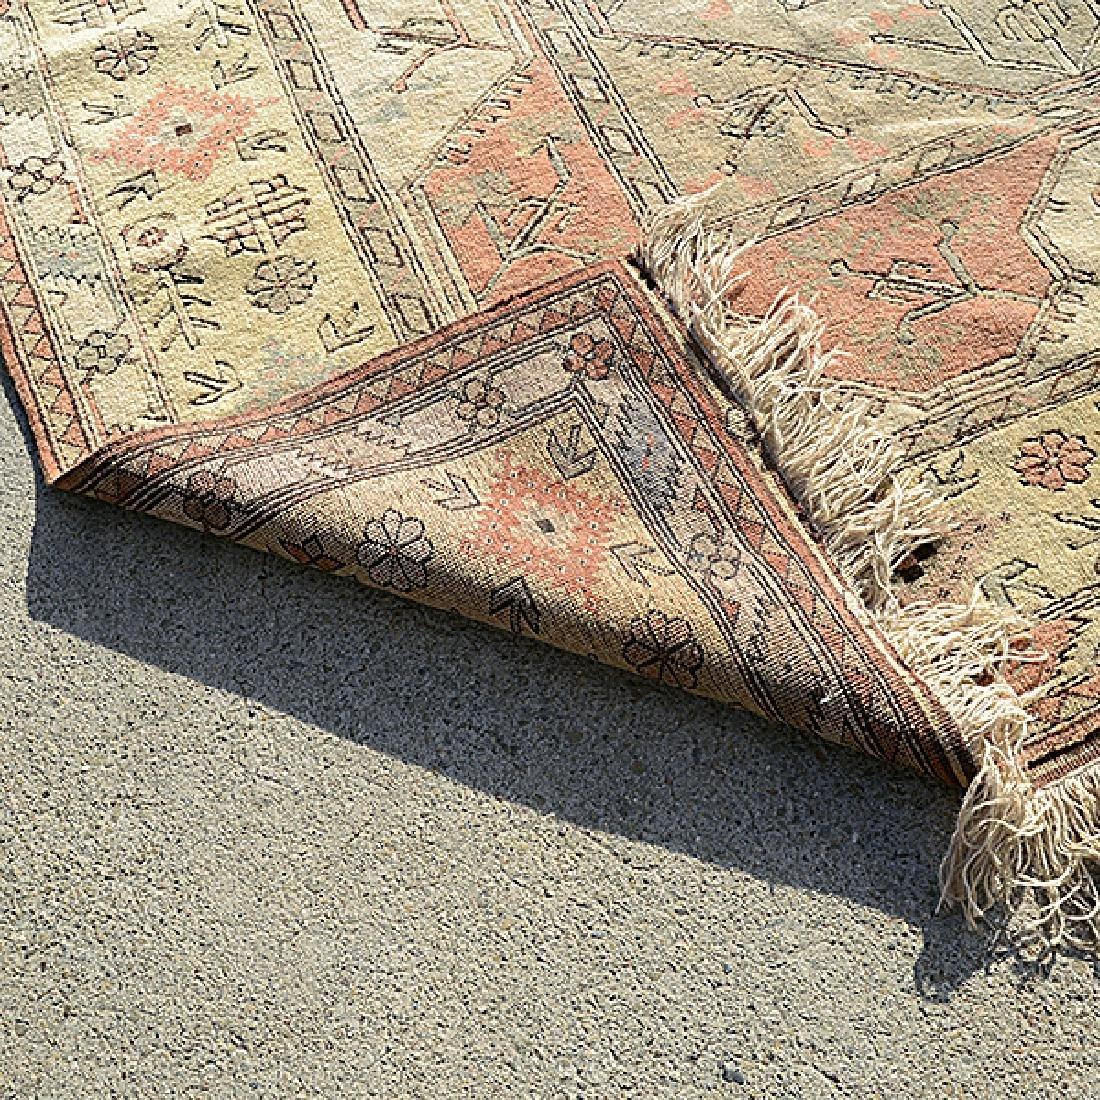 Turkish Wedding Carpet: 8 feet 2 inches x 11 feet 10 - 3